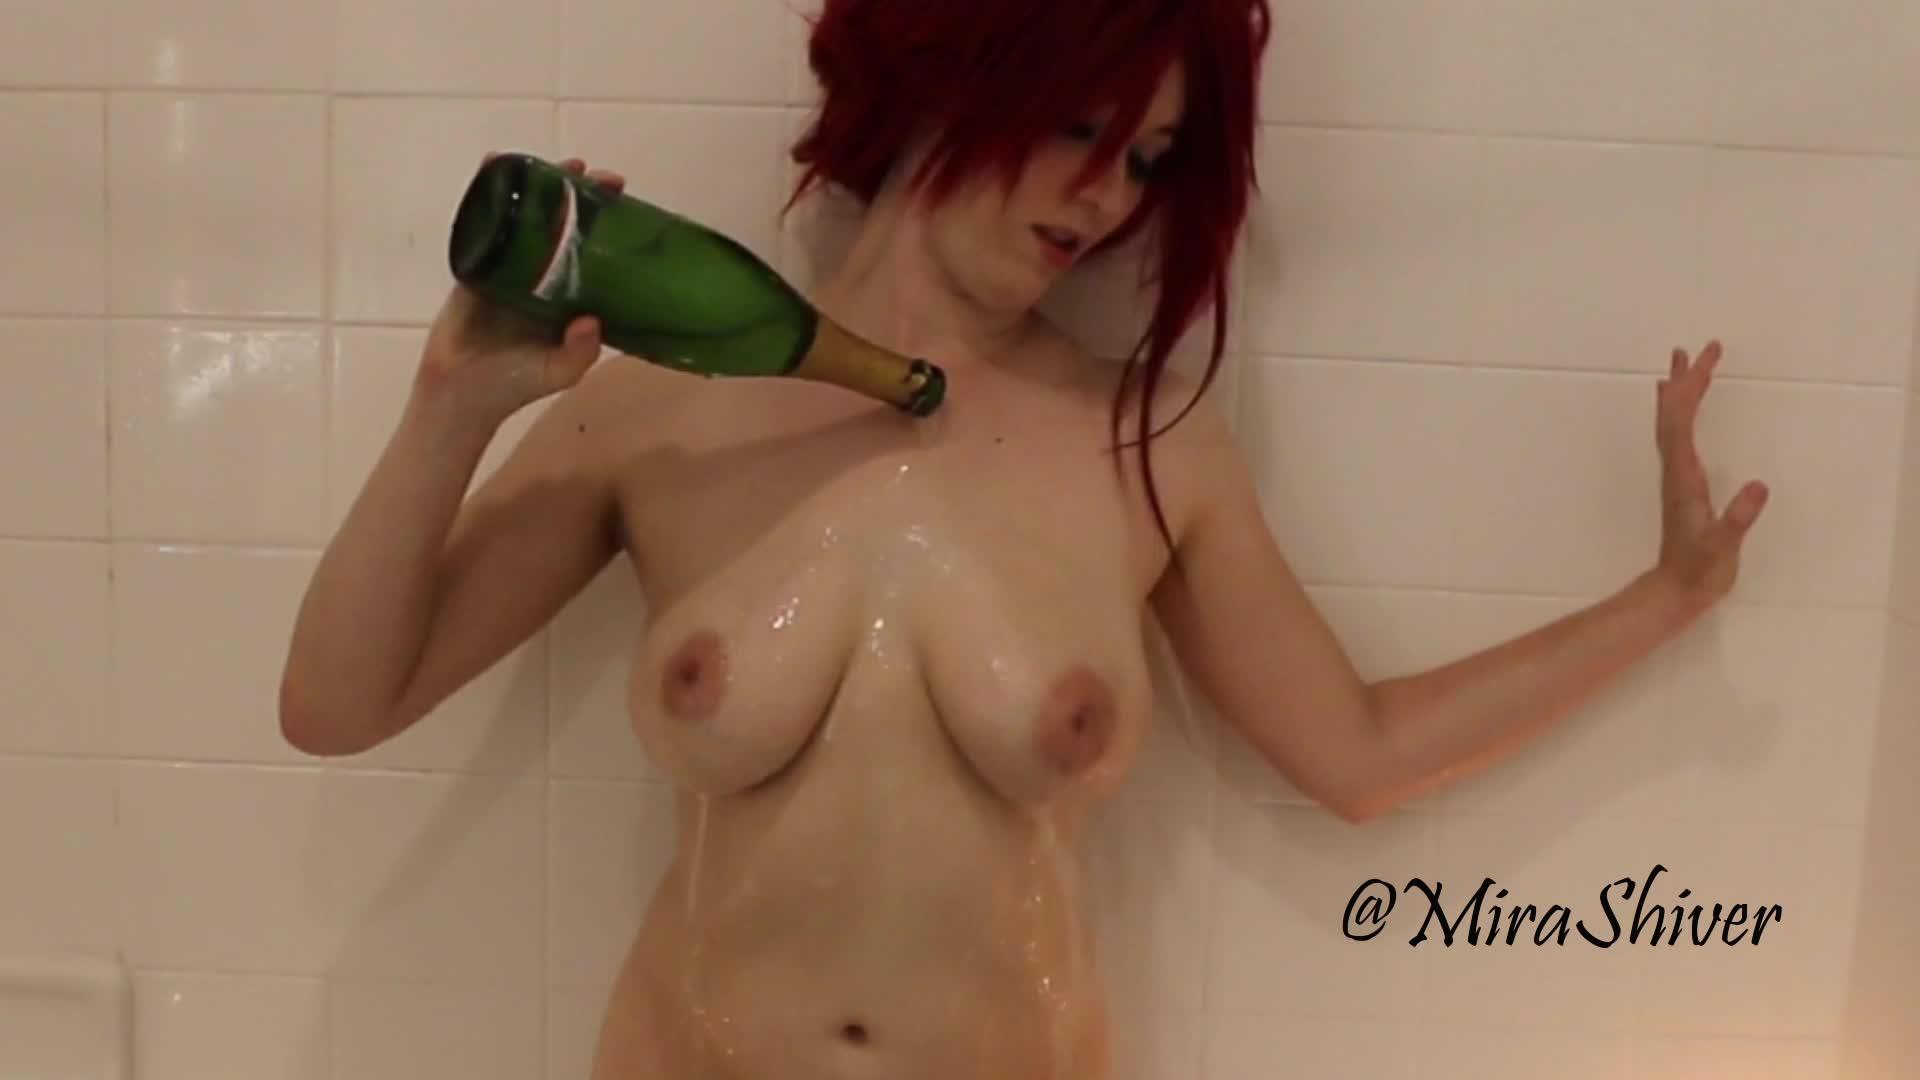 """Mira Shiver"" (Bathtub Fetish, Shower, Cosplay, Food, Costume) Rias Gremory Champagne SloMo - ManyVids Production"